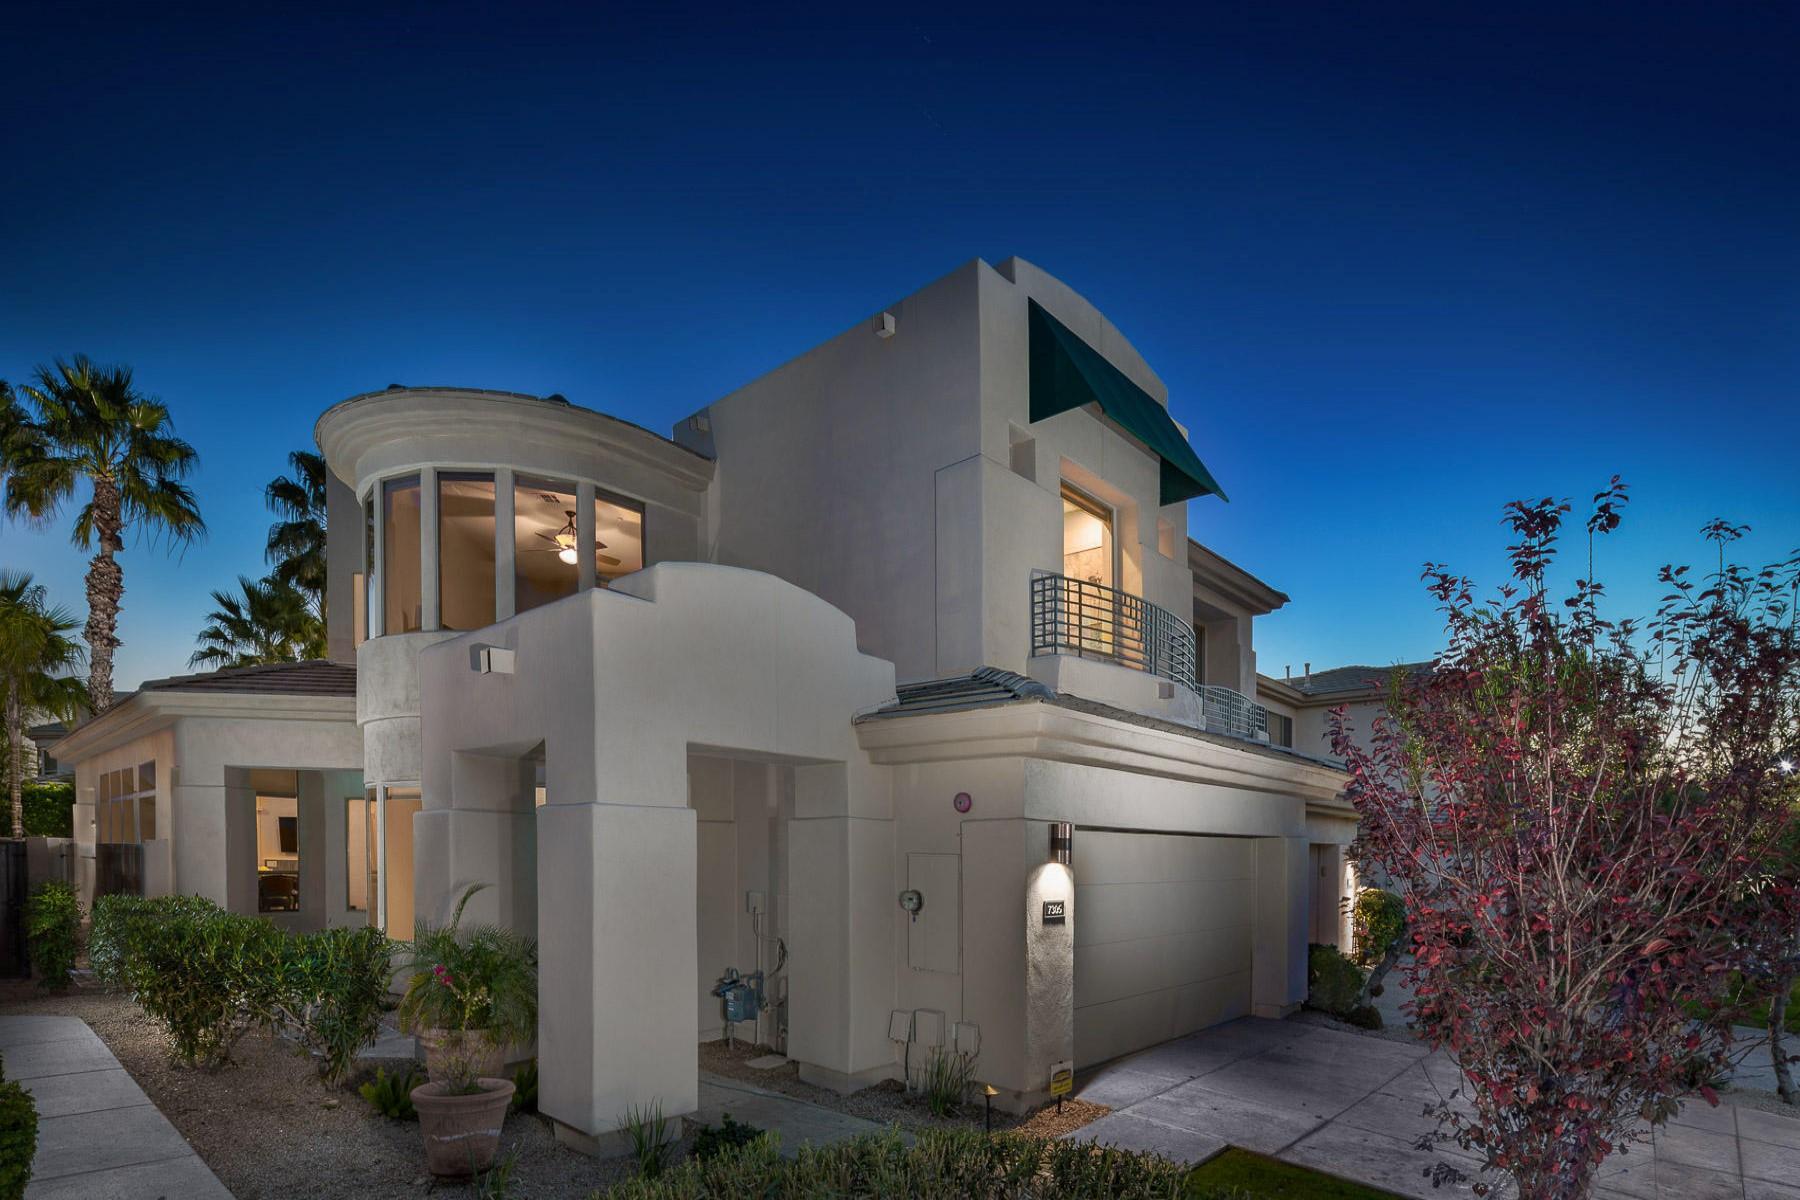 Townhouse for Sale at Stunning Scottsdale home 7305 E Del Acero Dr Scottsdale, Arizona, 85258 United States